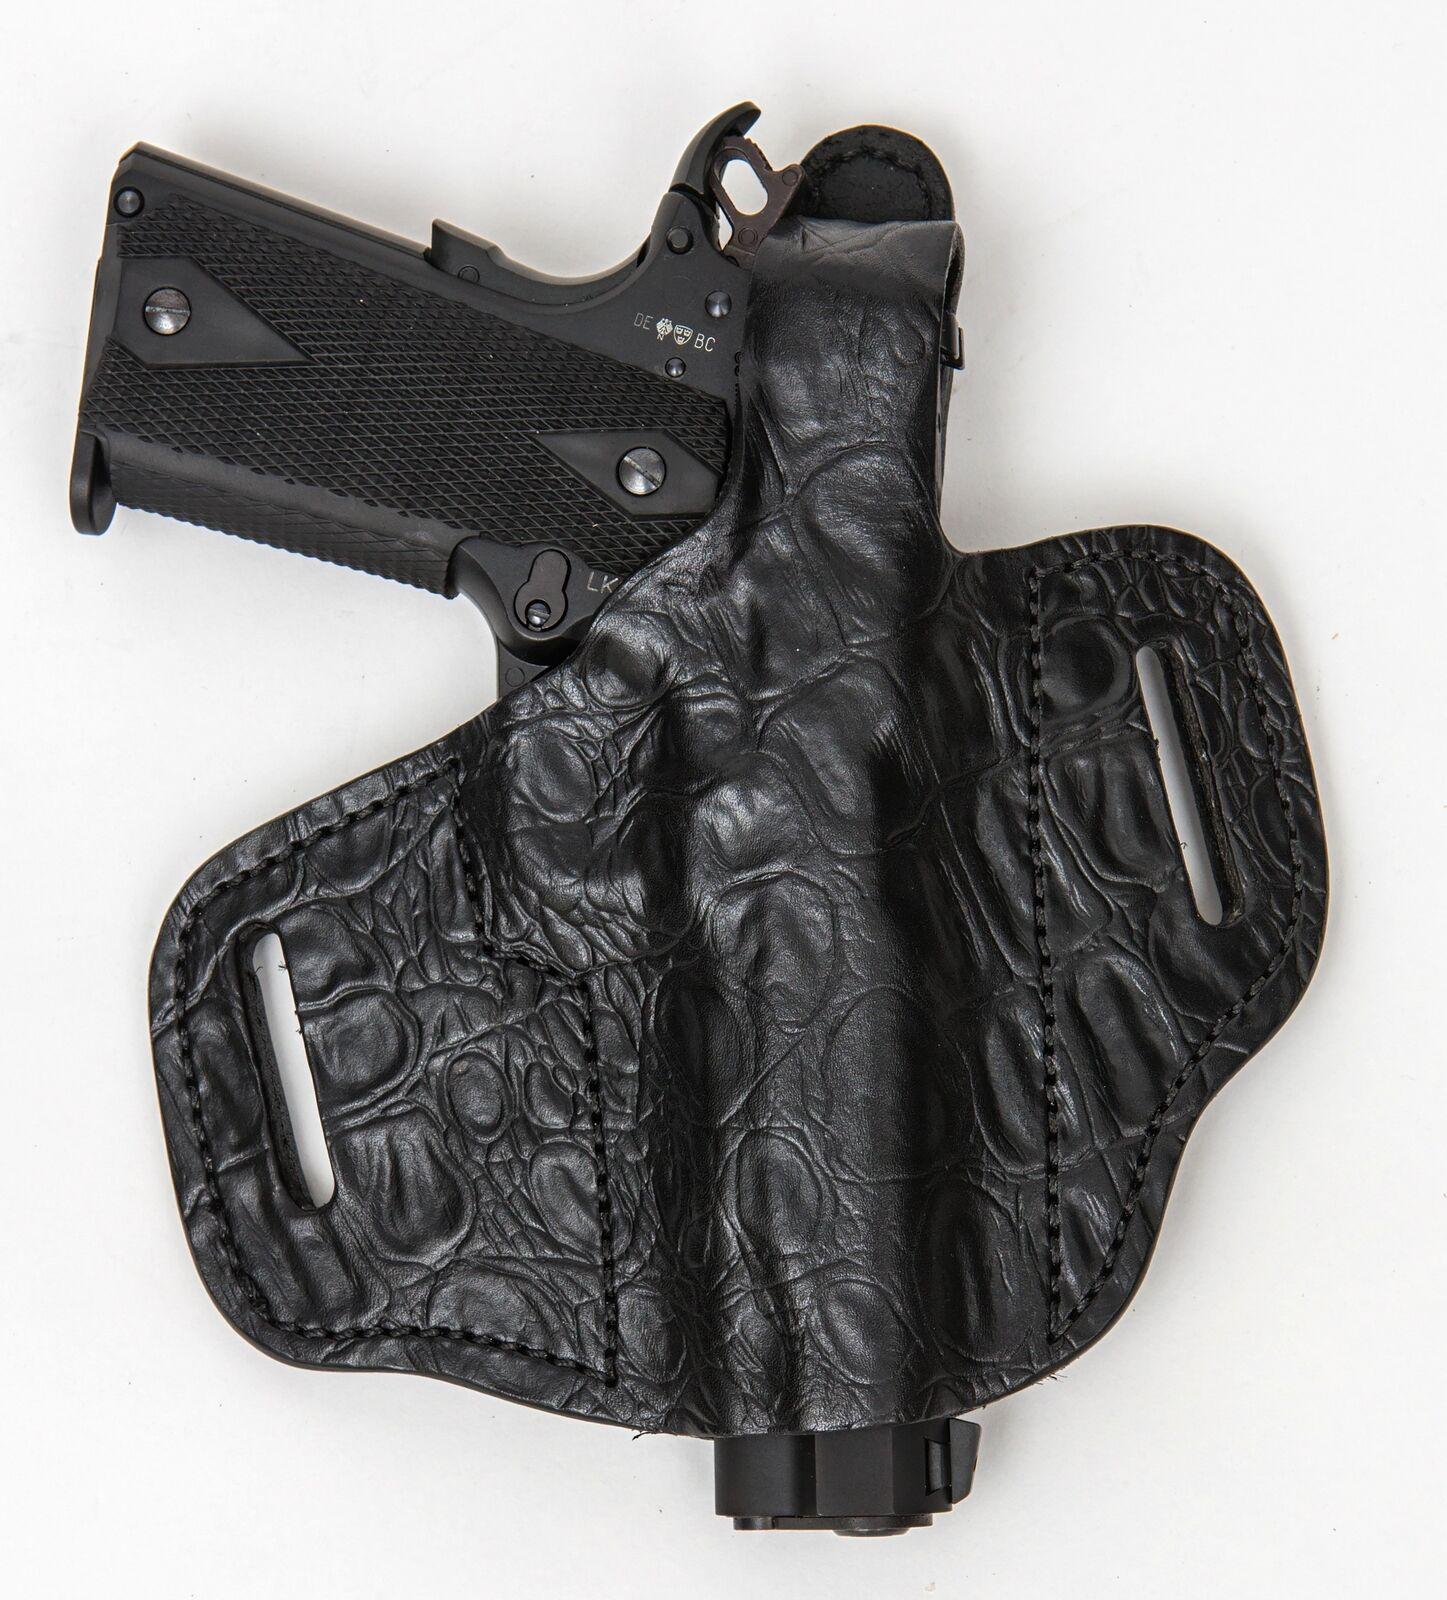 On Duty Conceal RH LH OWB Leder Gun Holster For FNS 9 Long Slide